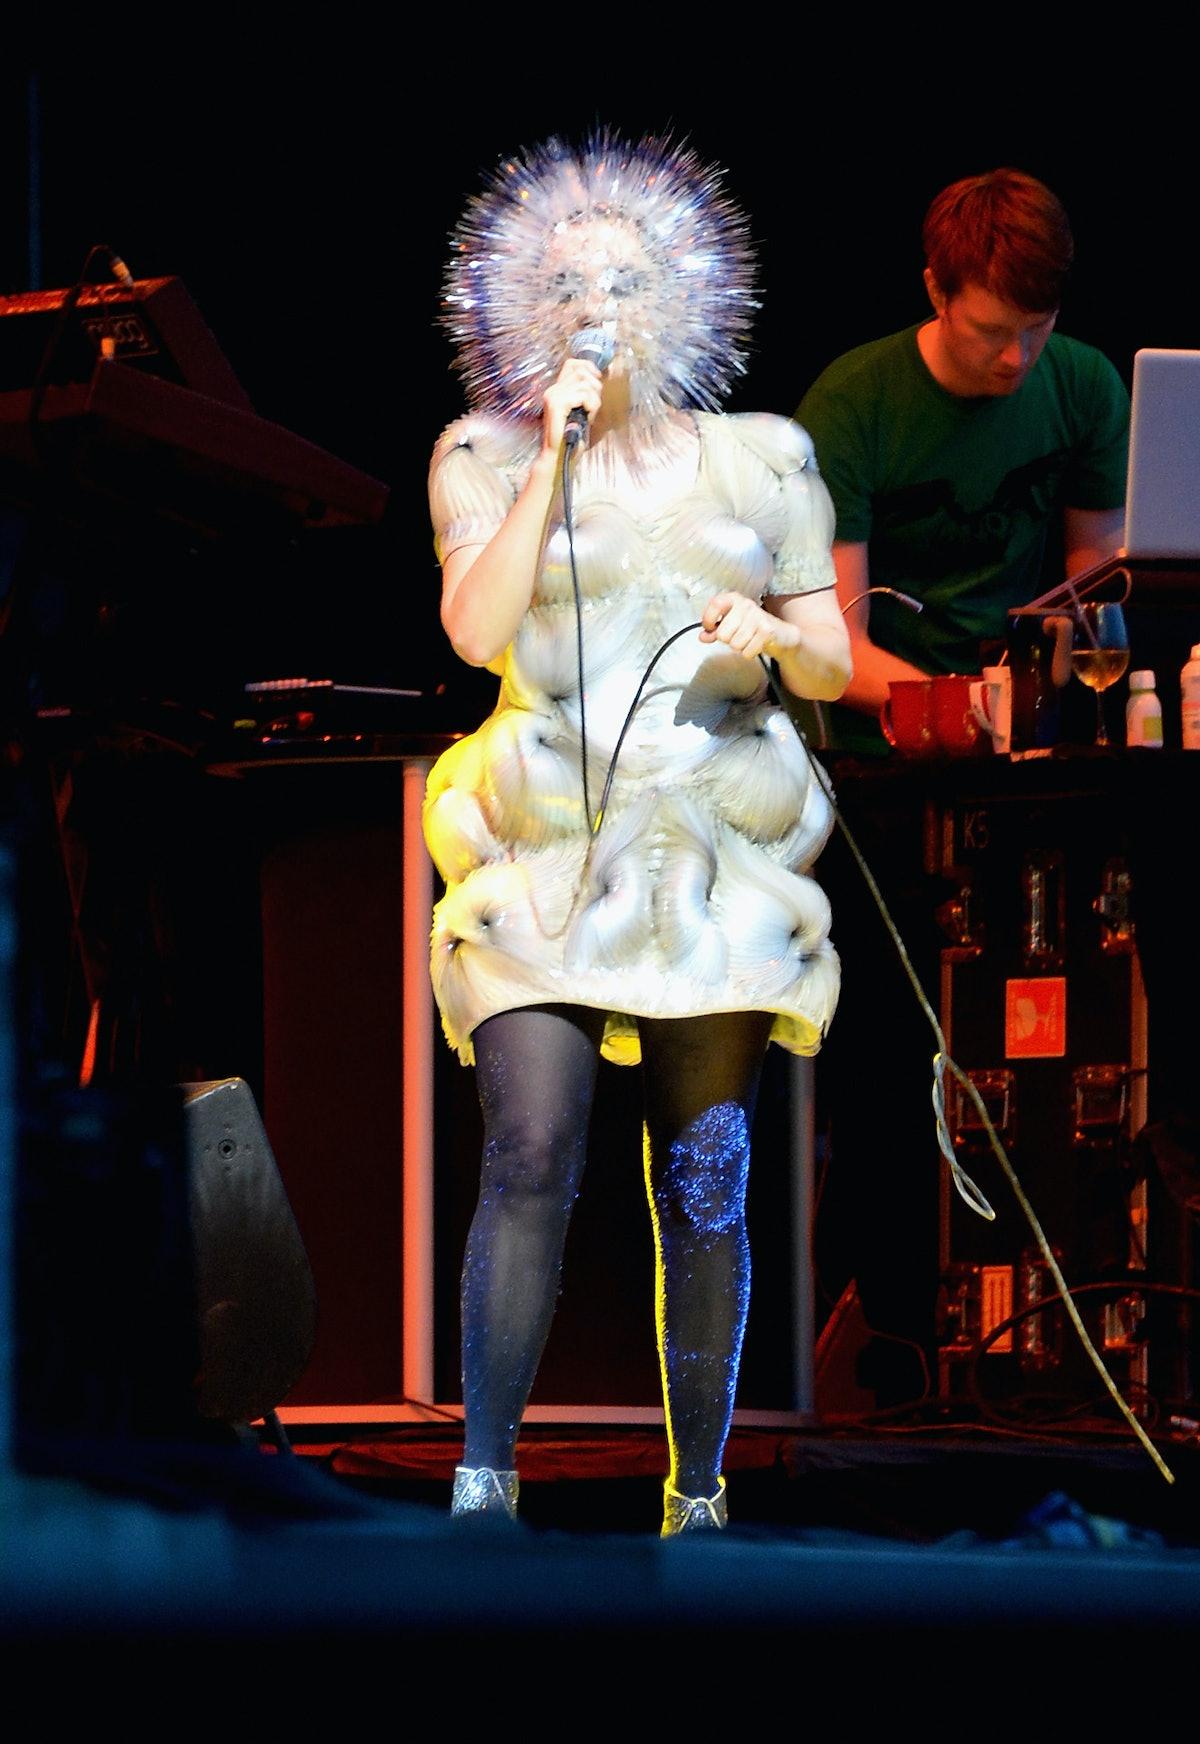 2013 Bonnaroo Music & Arts Festival - Day 3